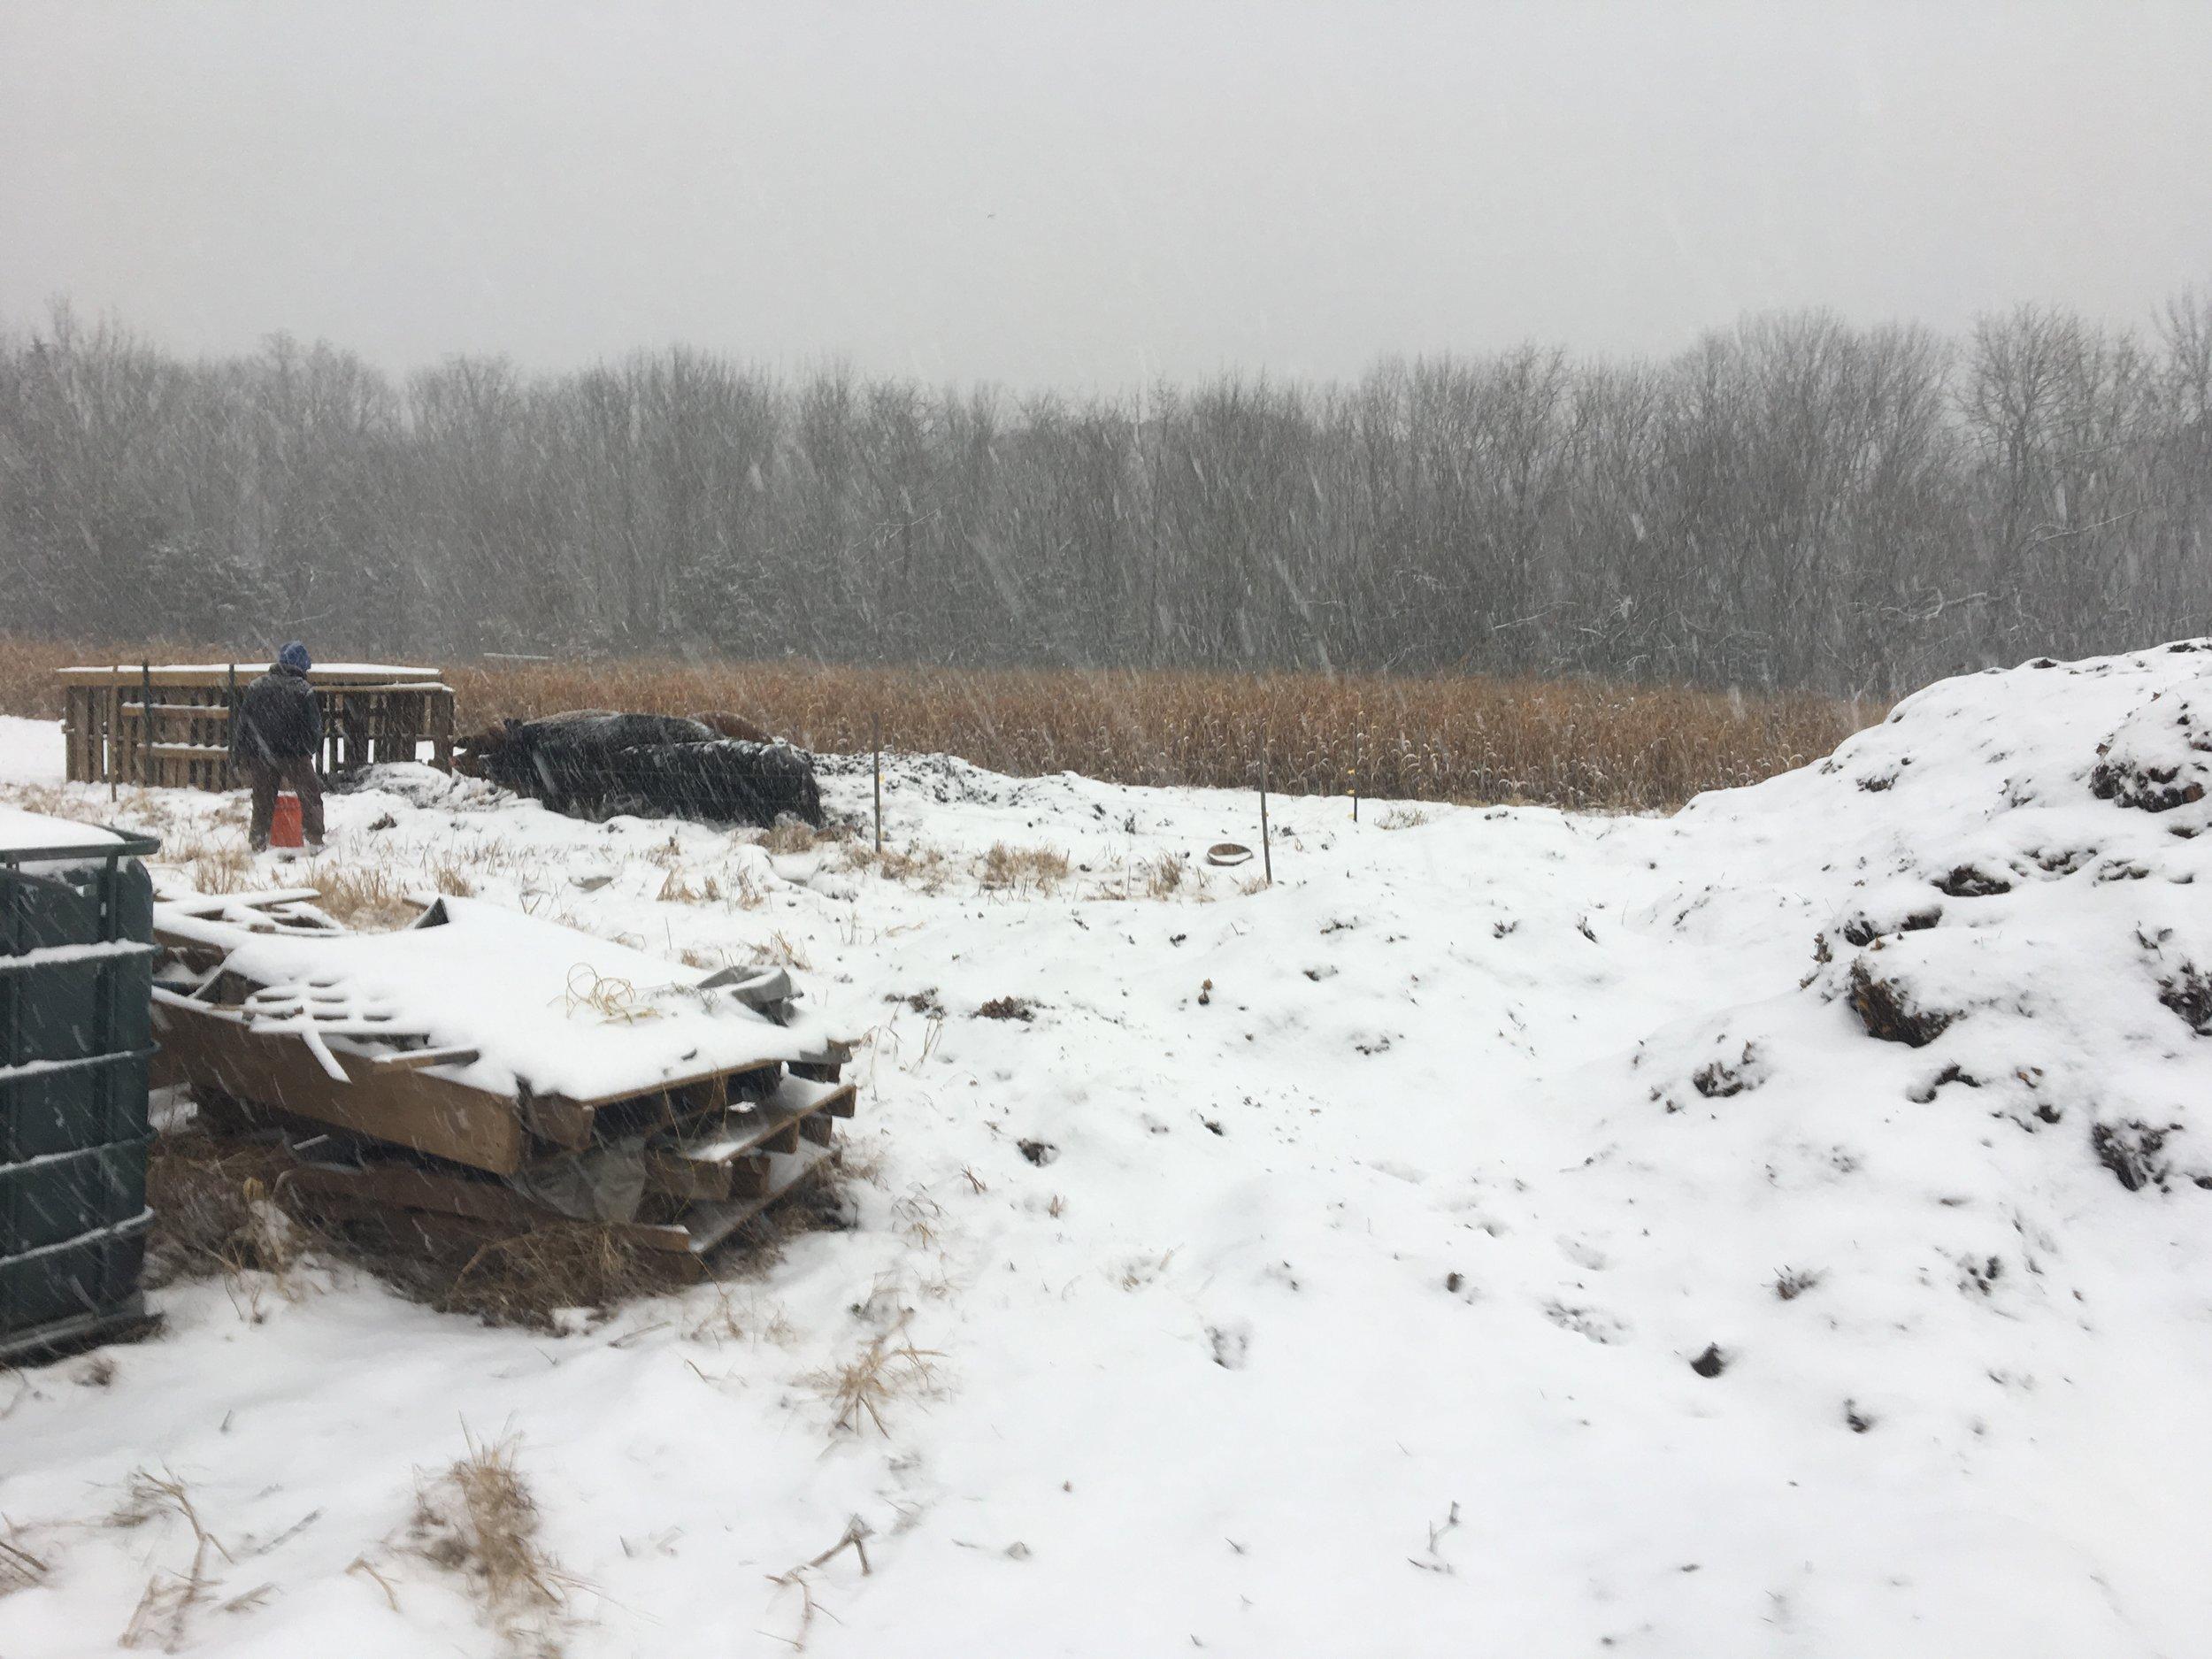 18 pic wk 24 - snow & pigs.JPG